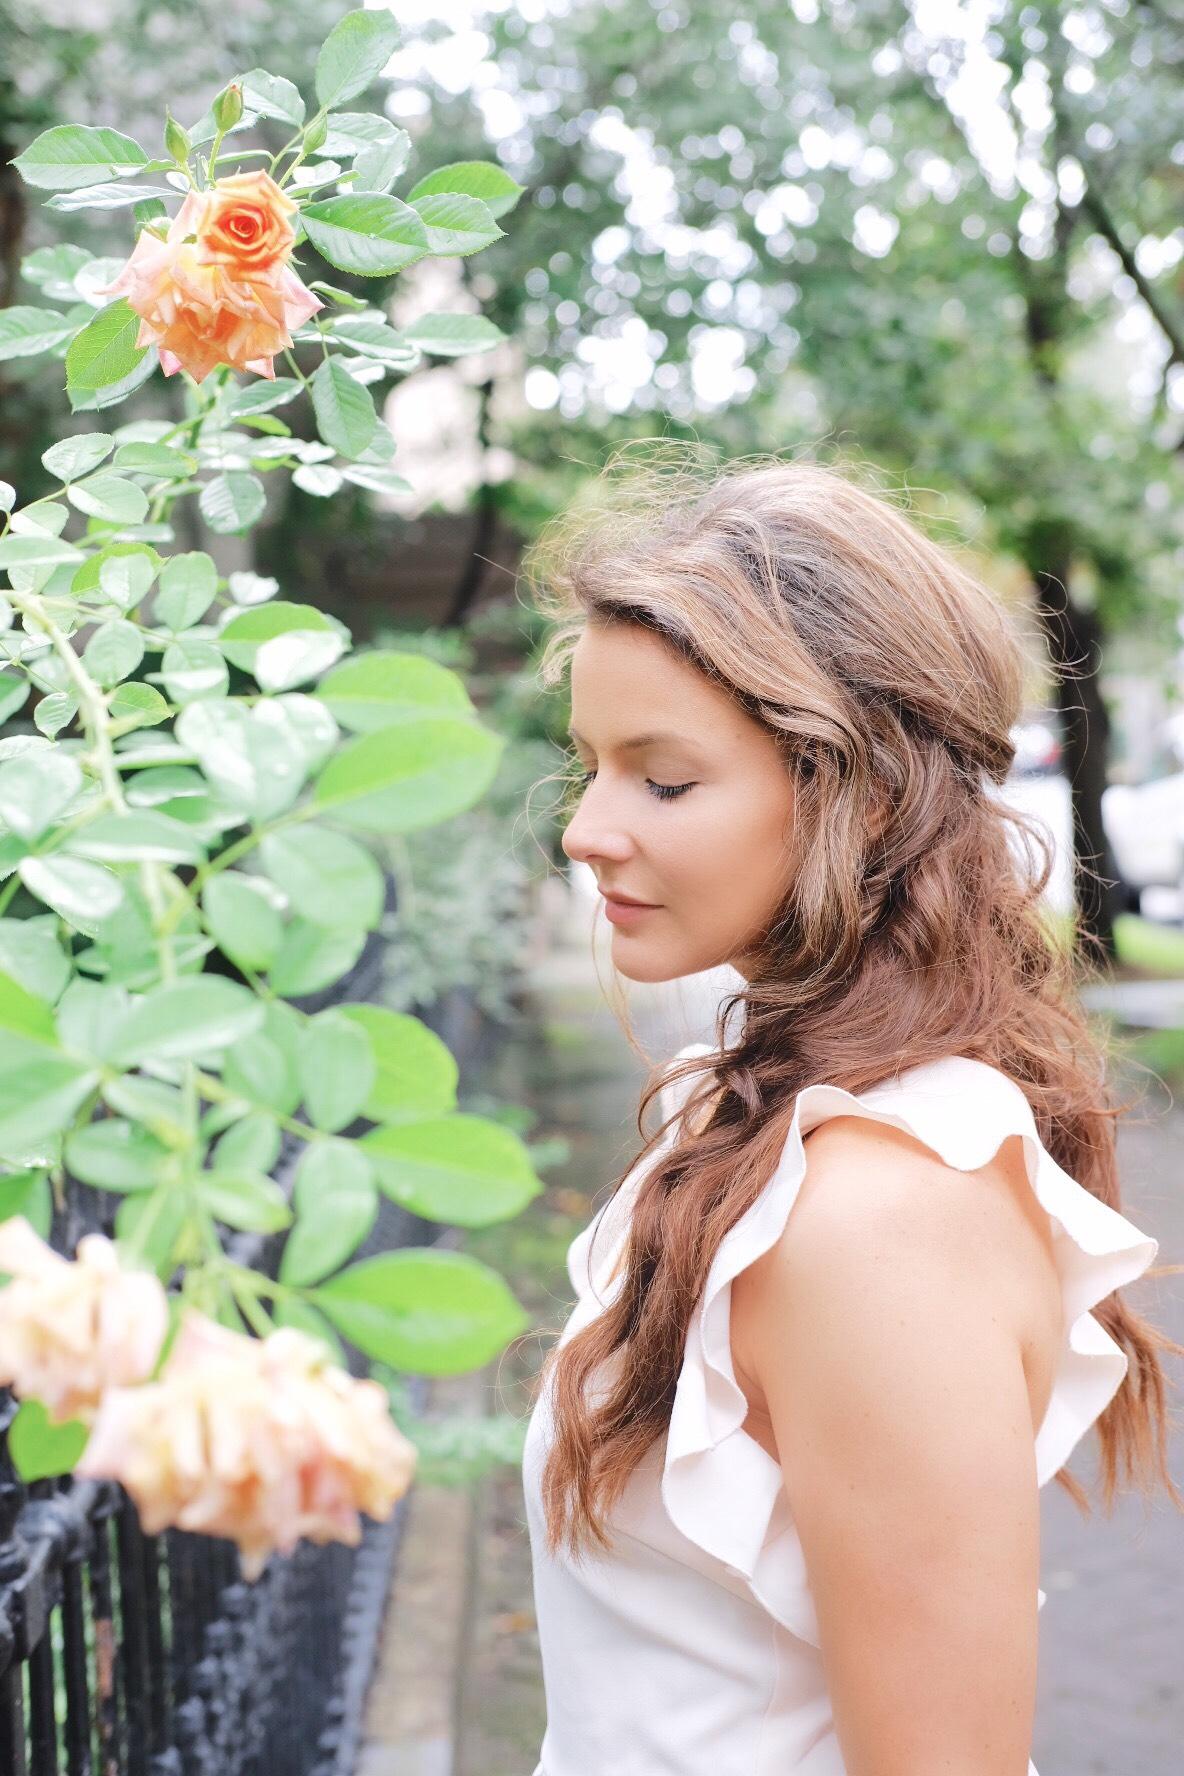 Brenna Lauren Michaels in Pink Dress by Roses